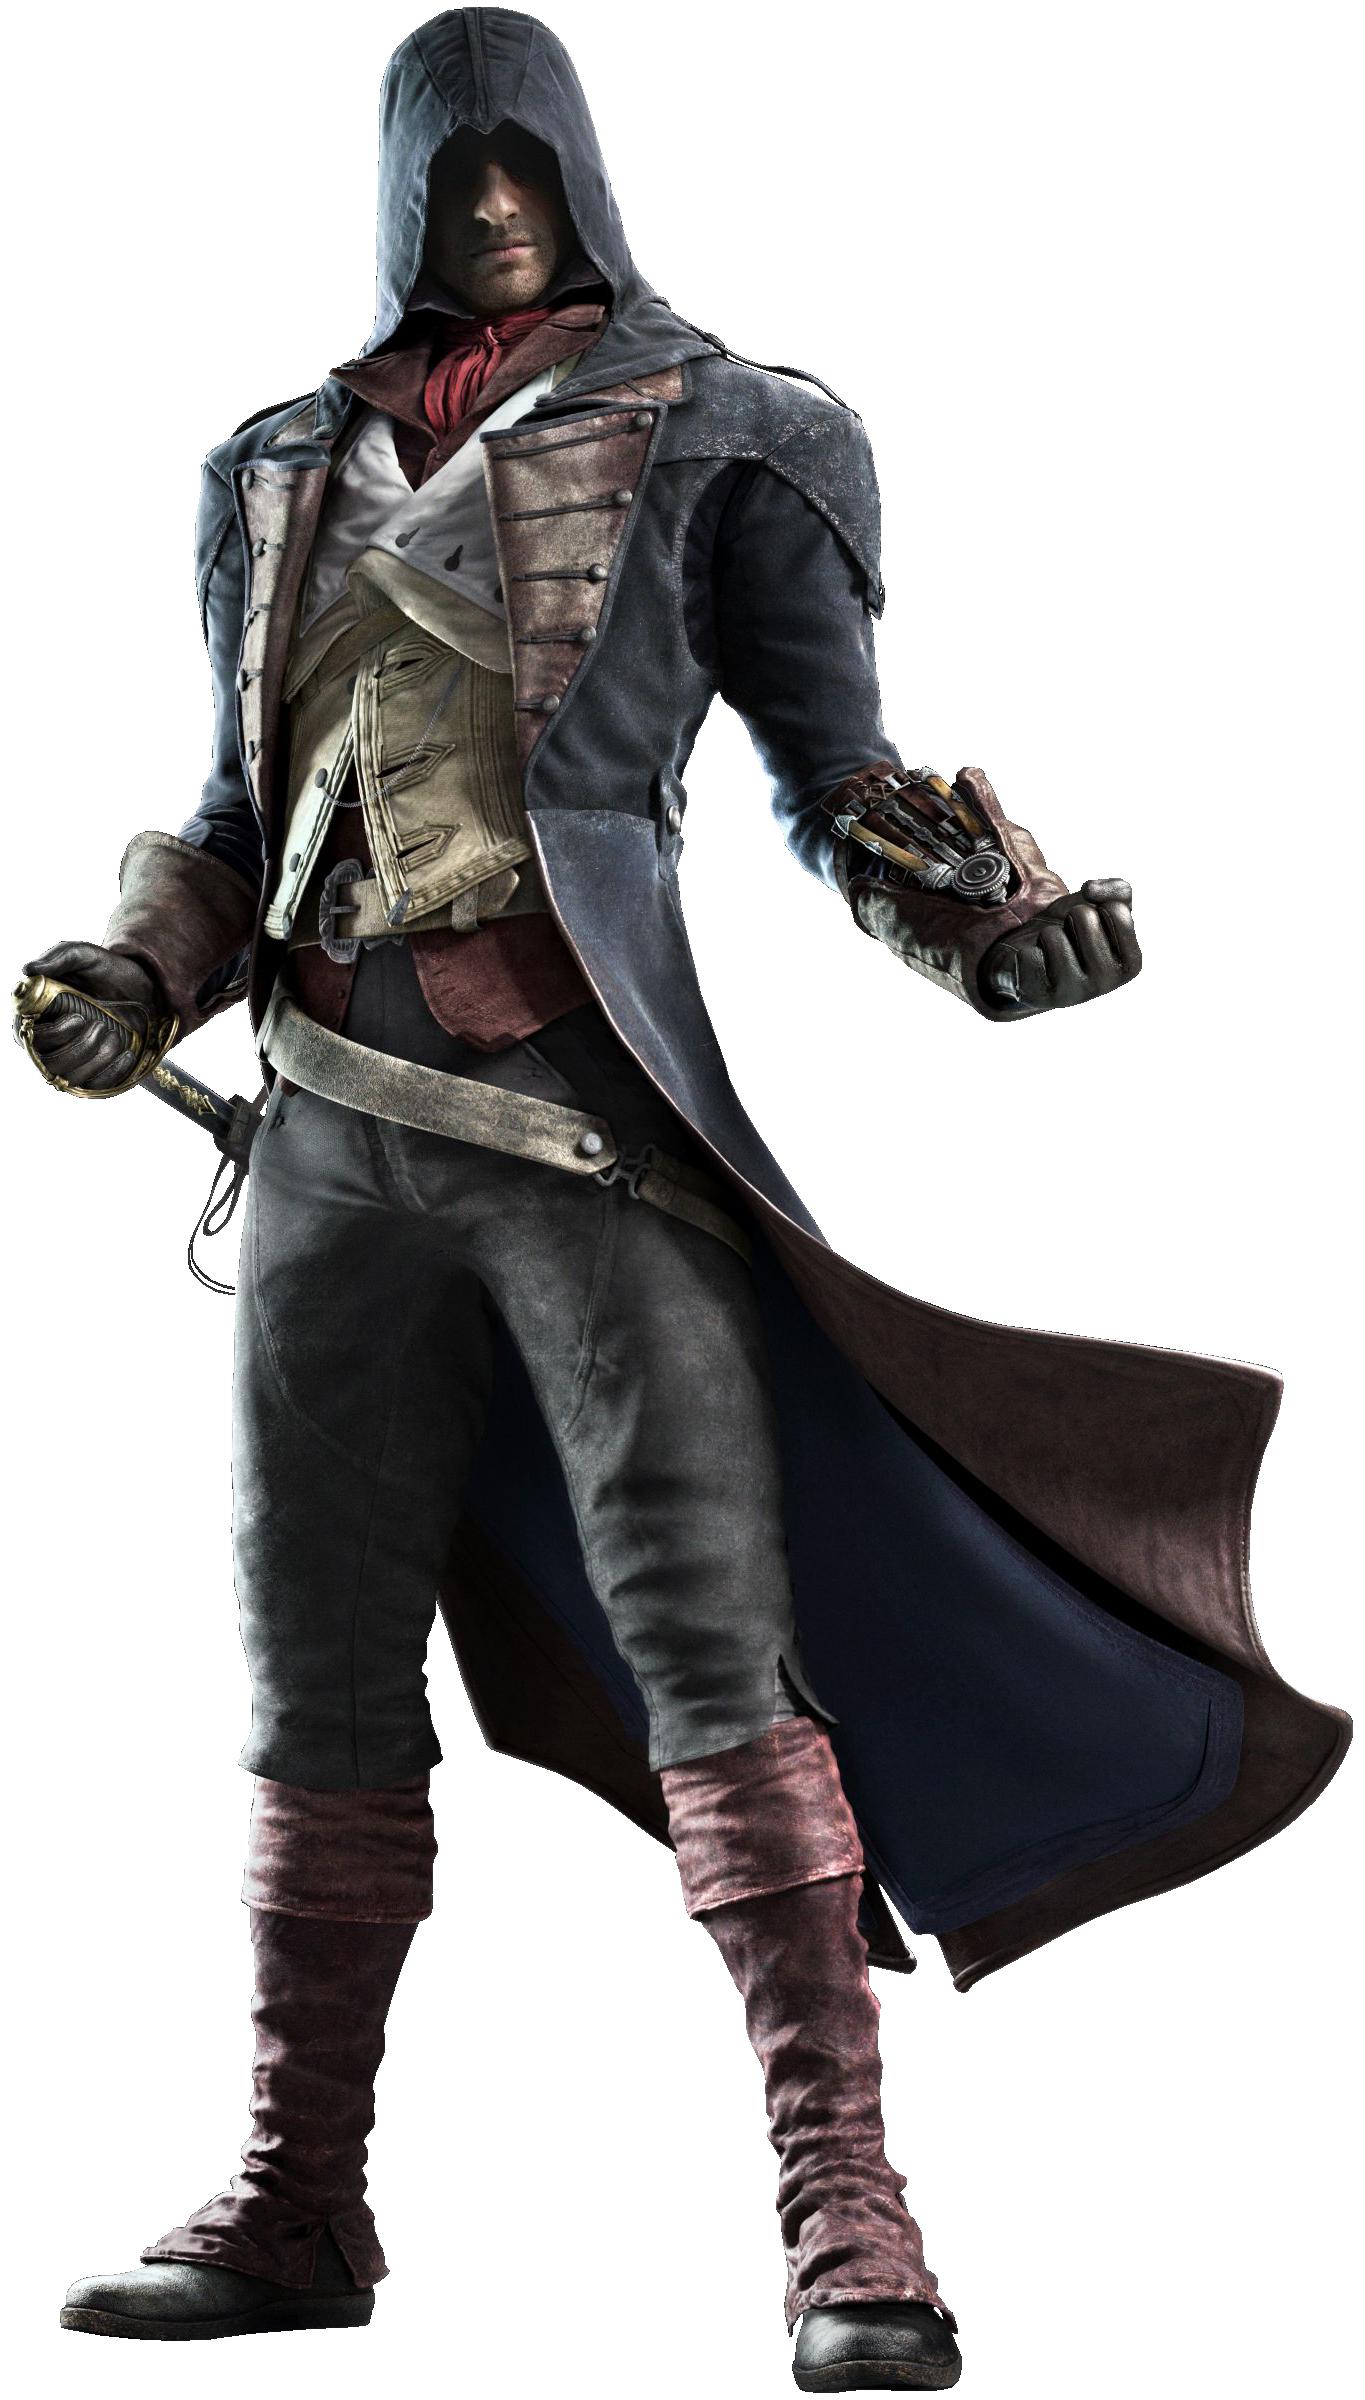 Arno Dorian The Assassin 39 S Creed Wiki Assassin 39 S Creed Assassins Creed Unity Arno Assassins Creed Art Assassins Creed Unity